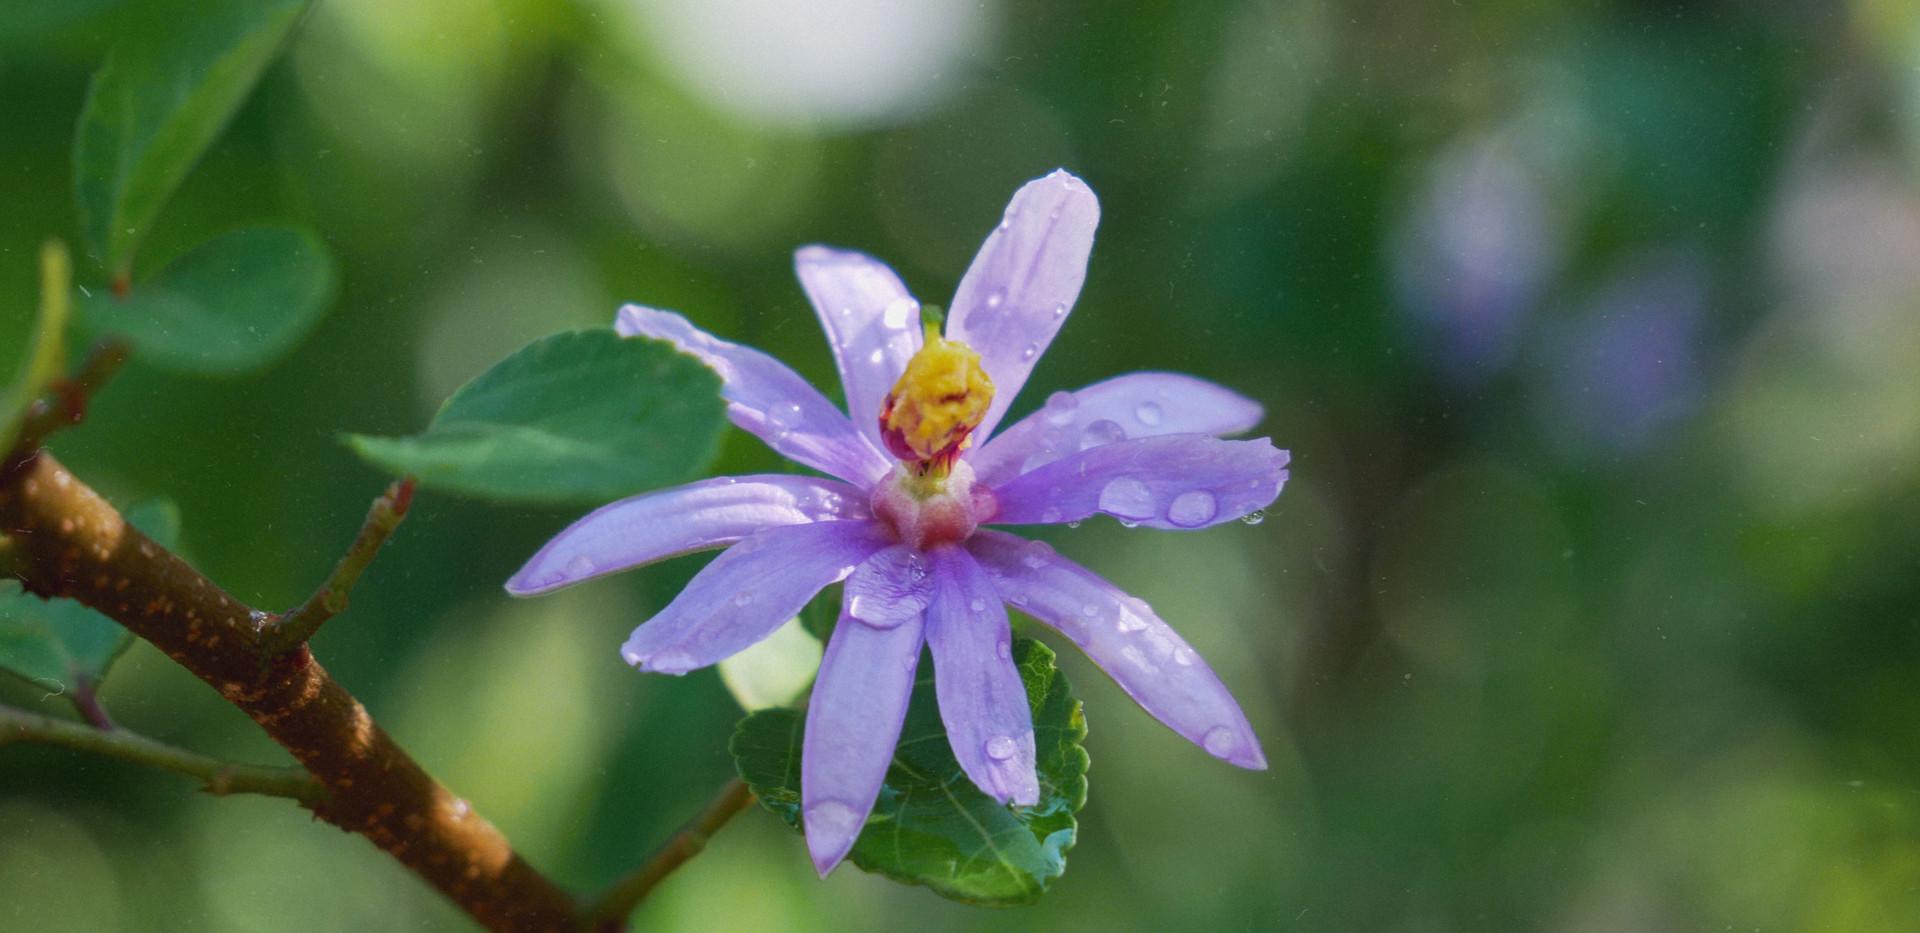 Purple flower with waterdrops